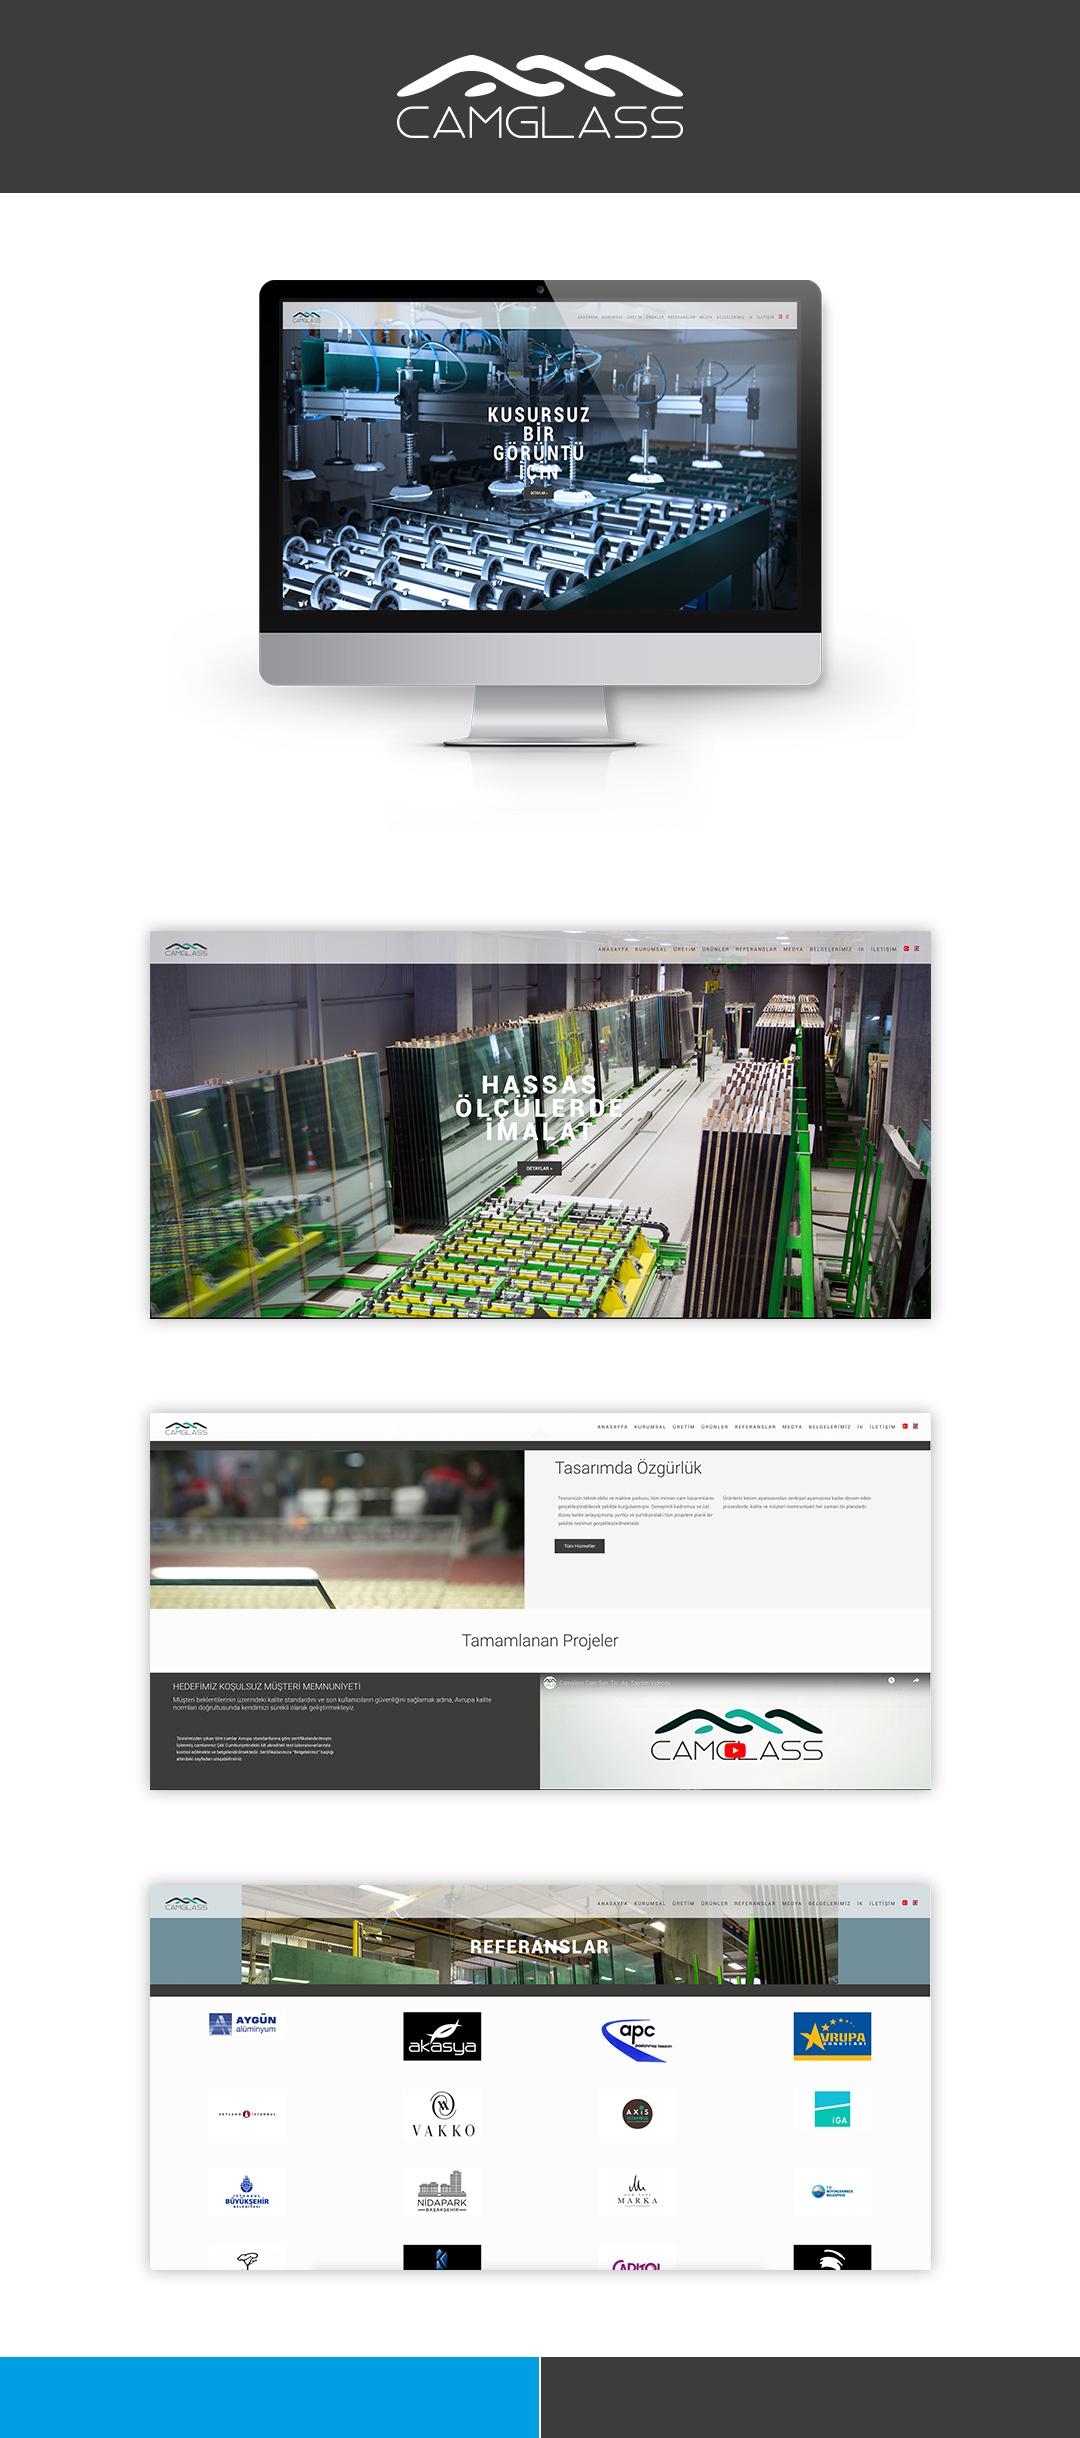 Camglass kurumsal web sitesi